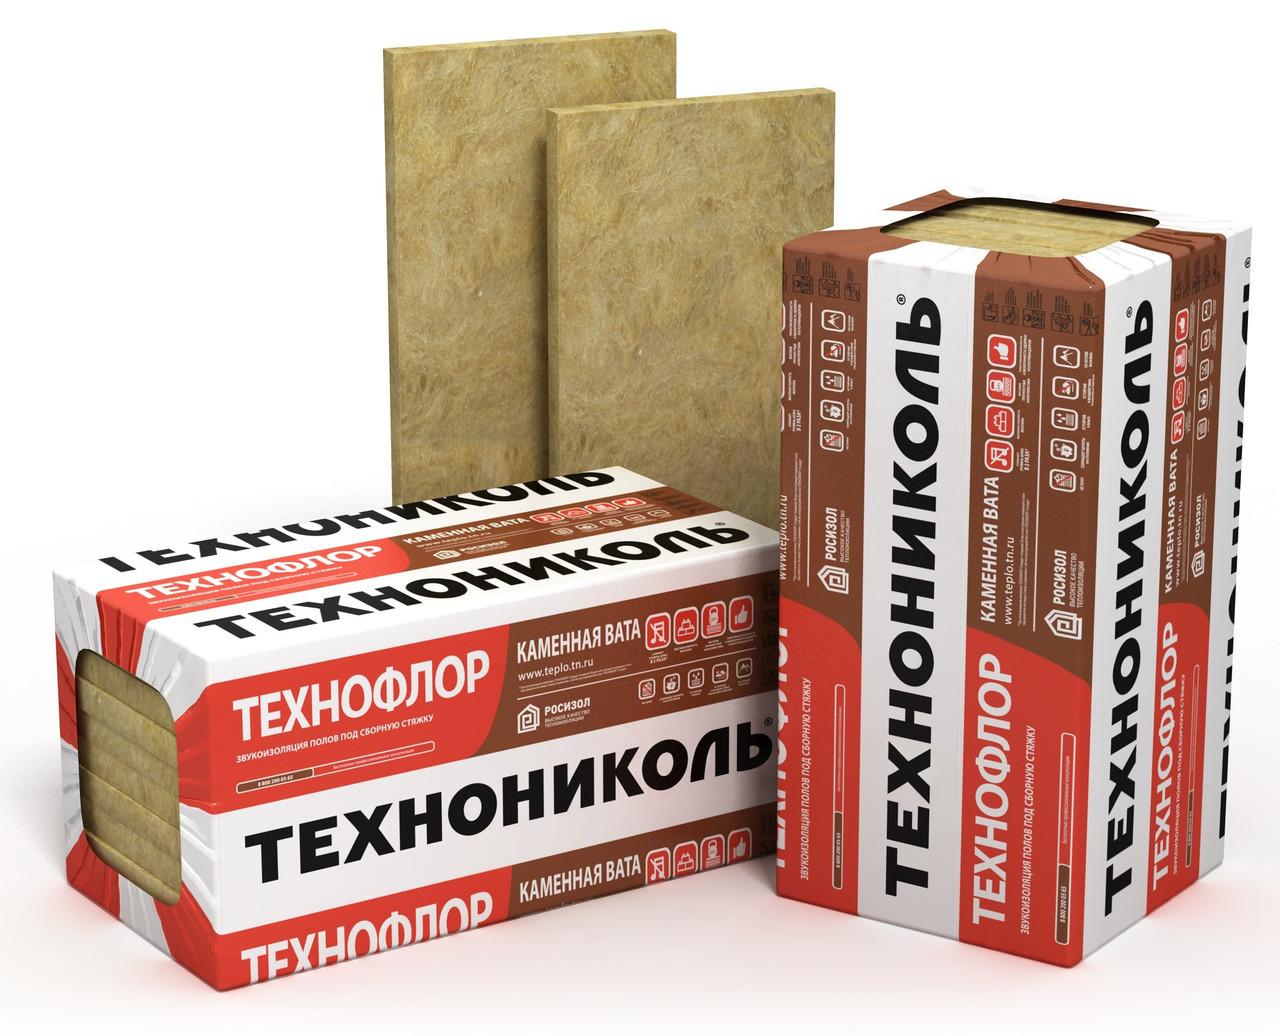 Вата мінеральна Sweetondale Технофлор Стандарт, 110 кг/куб.м 80 мм